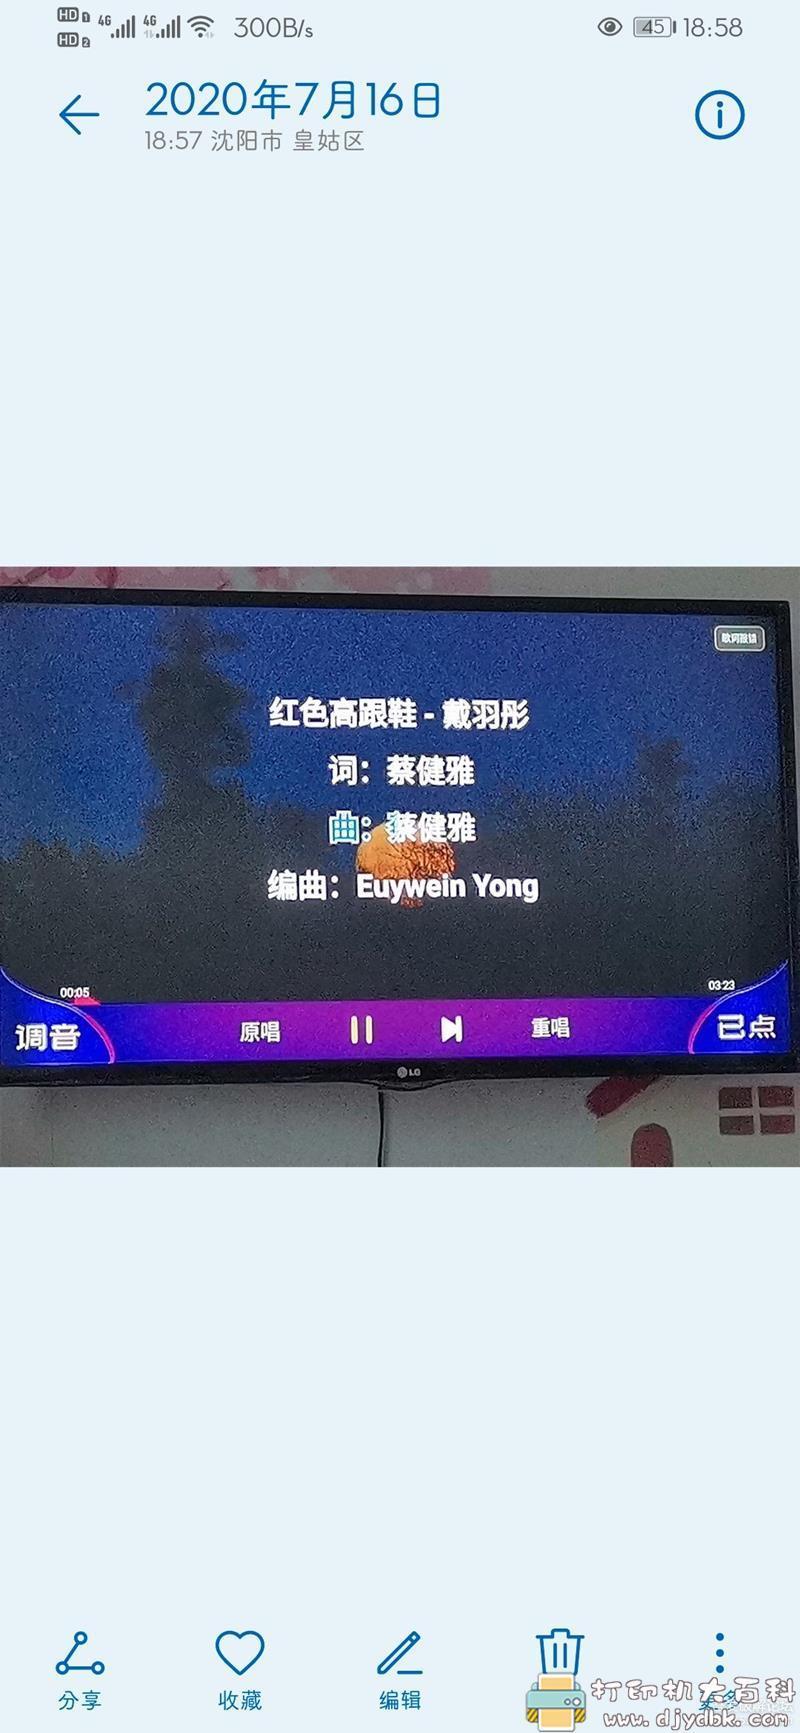 [Android]电视盒子可用的ktv软件 无需会员 配图 No.2